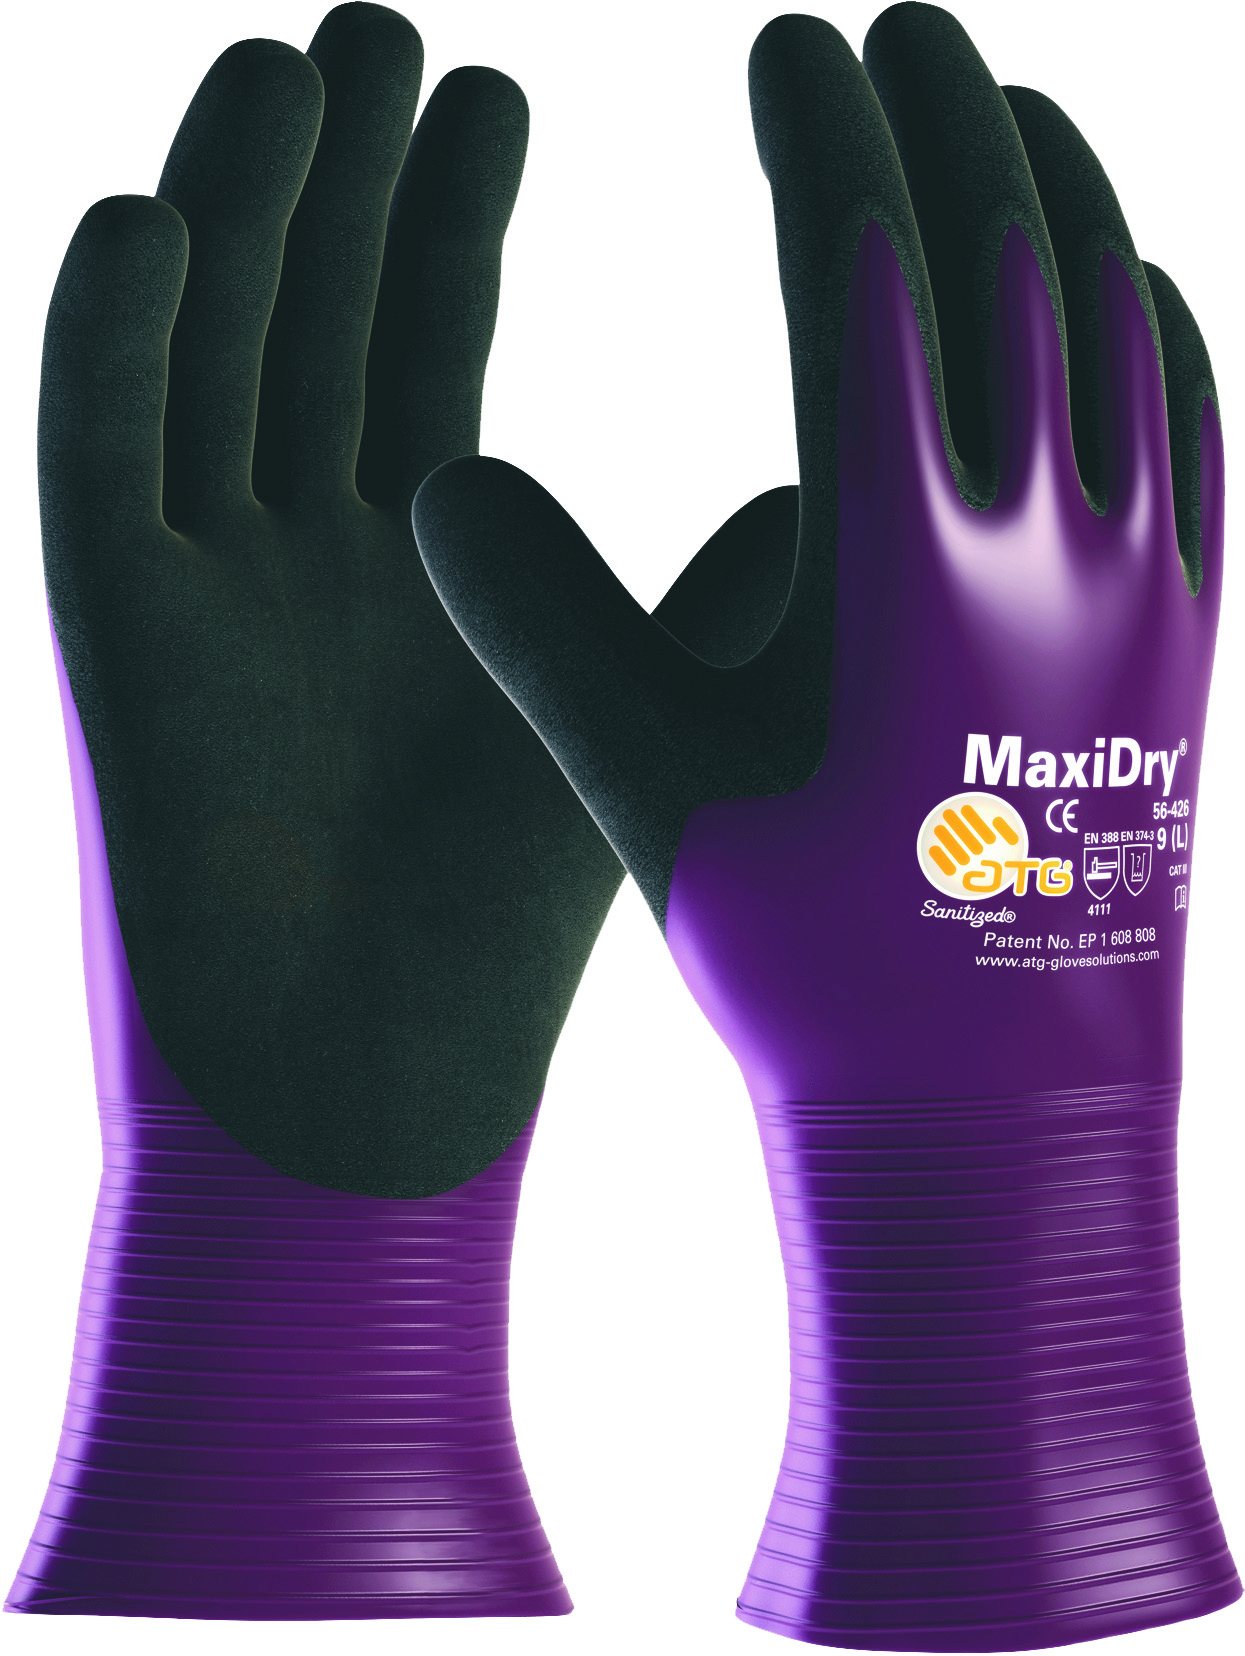 Maxi Dry Handschuh